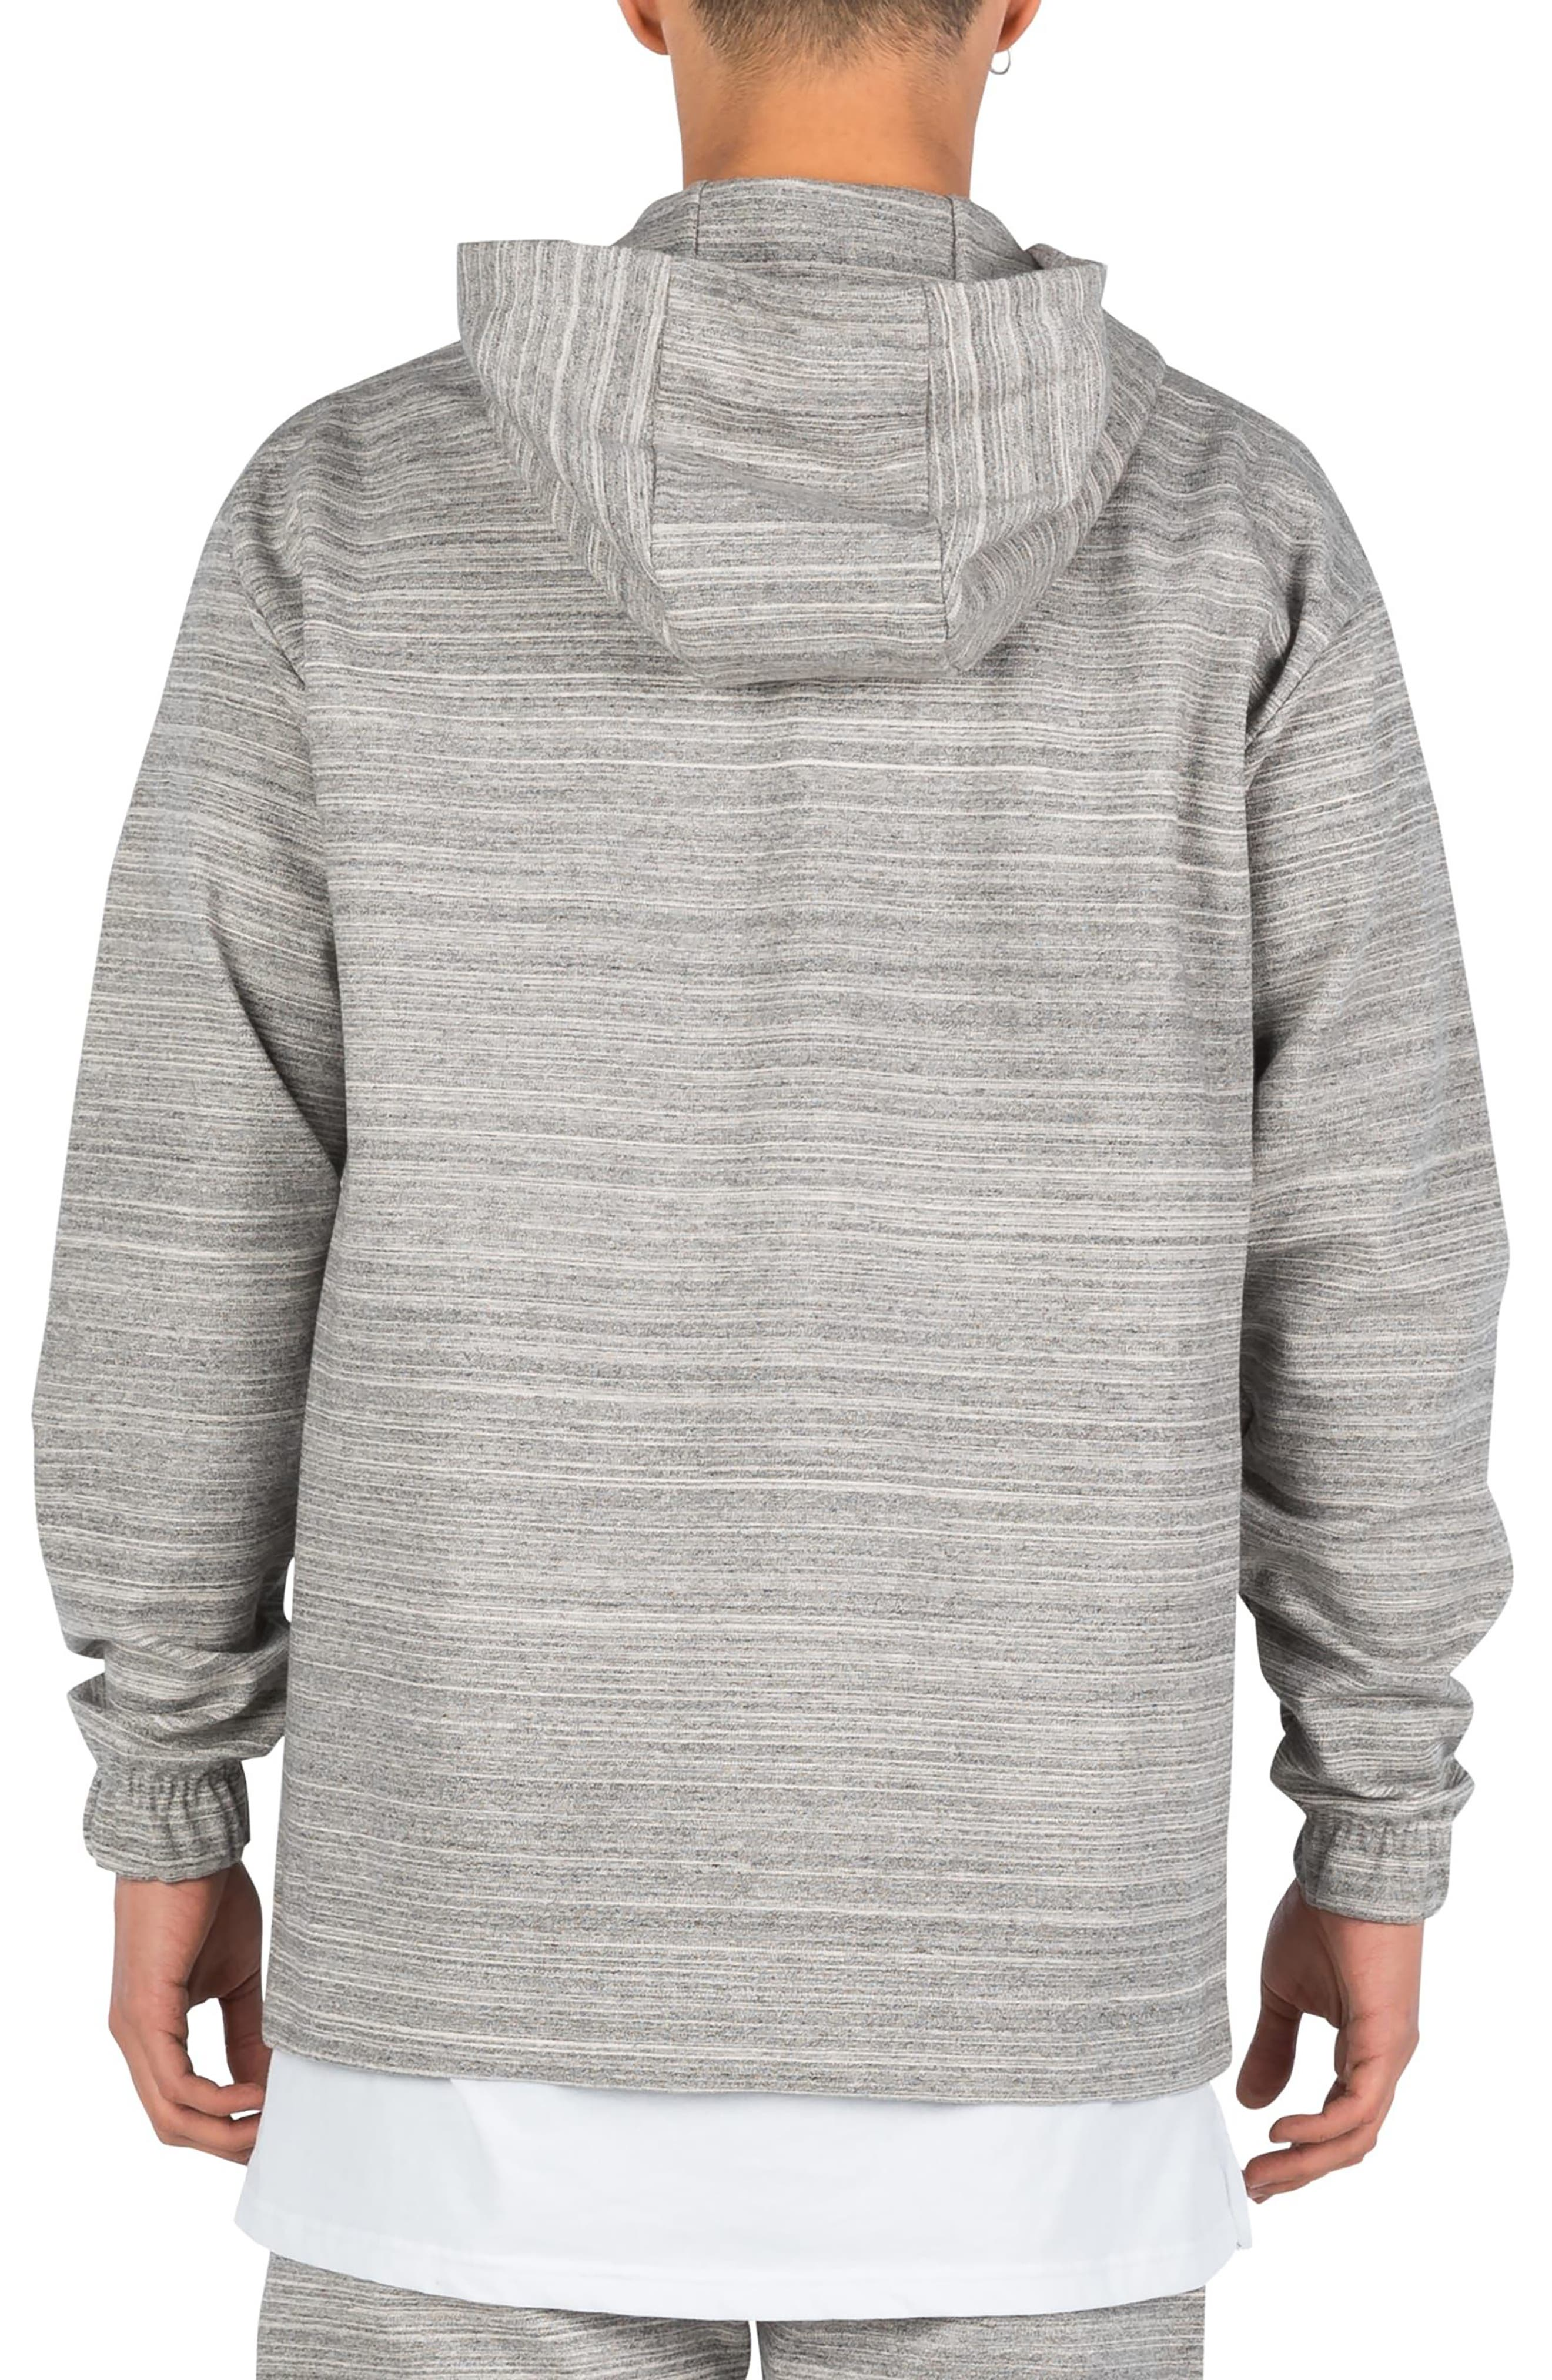 Tech Hoodie Sweatshirt,                             Alternate thumbnail 2, color,                             031